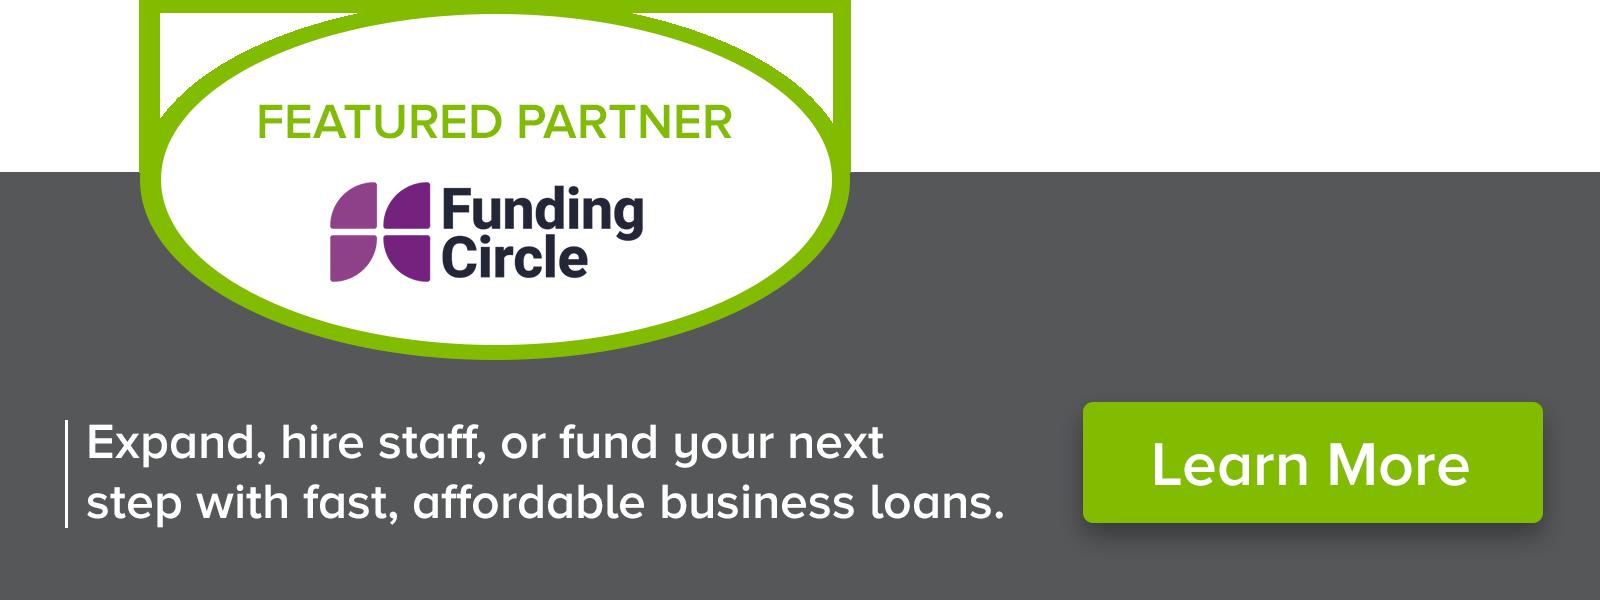 funding-circle-partnership-cta-blog